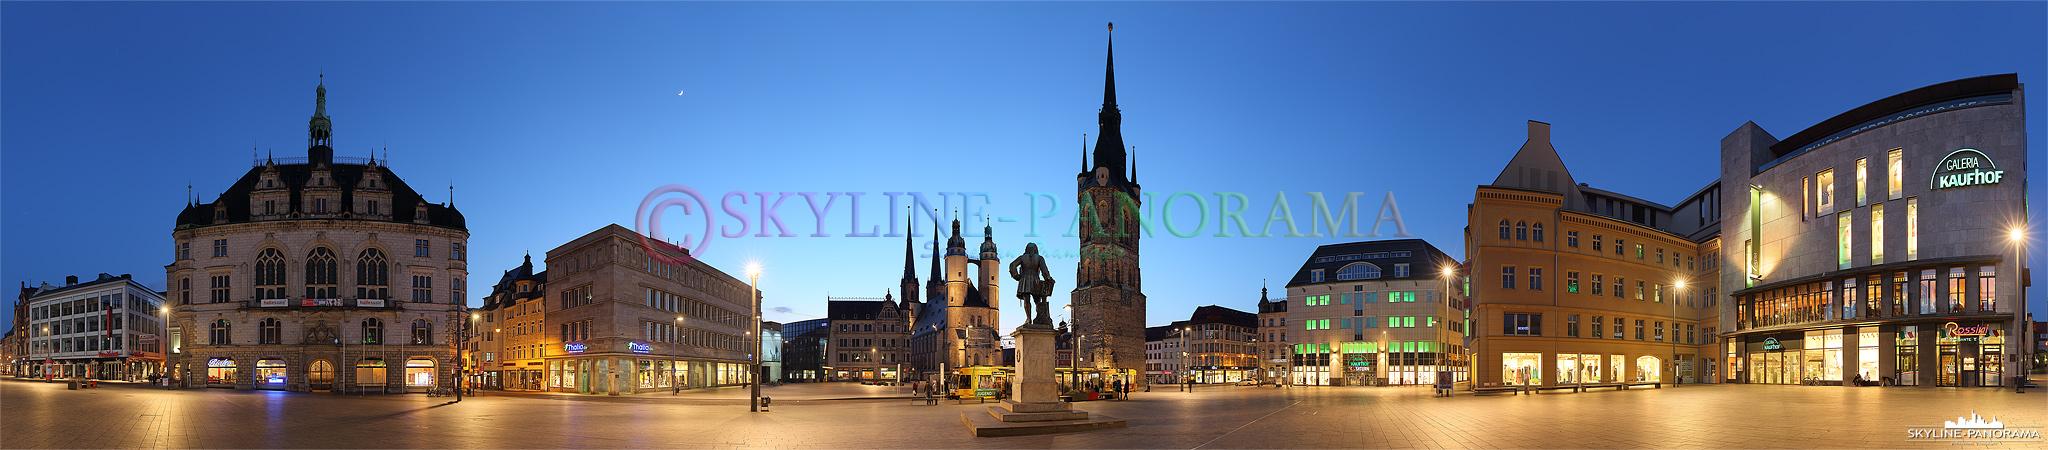 panorama halle marktplatz p 00753 skyline. Black Bedroom Furniture Sets. Home Design Ideas